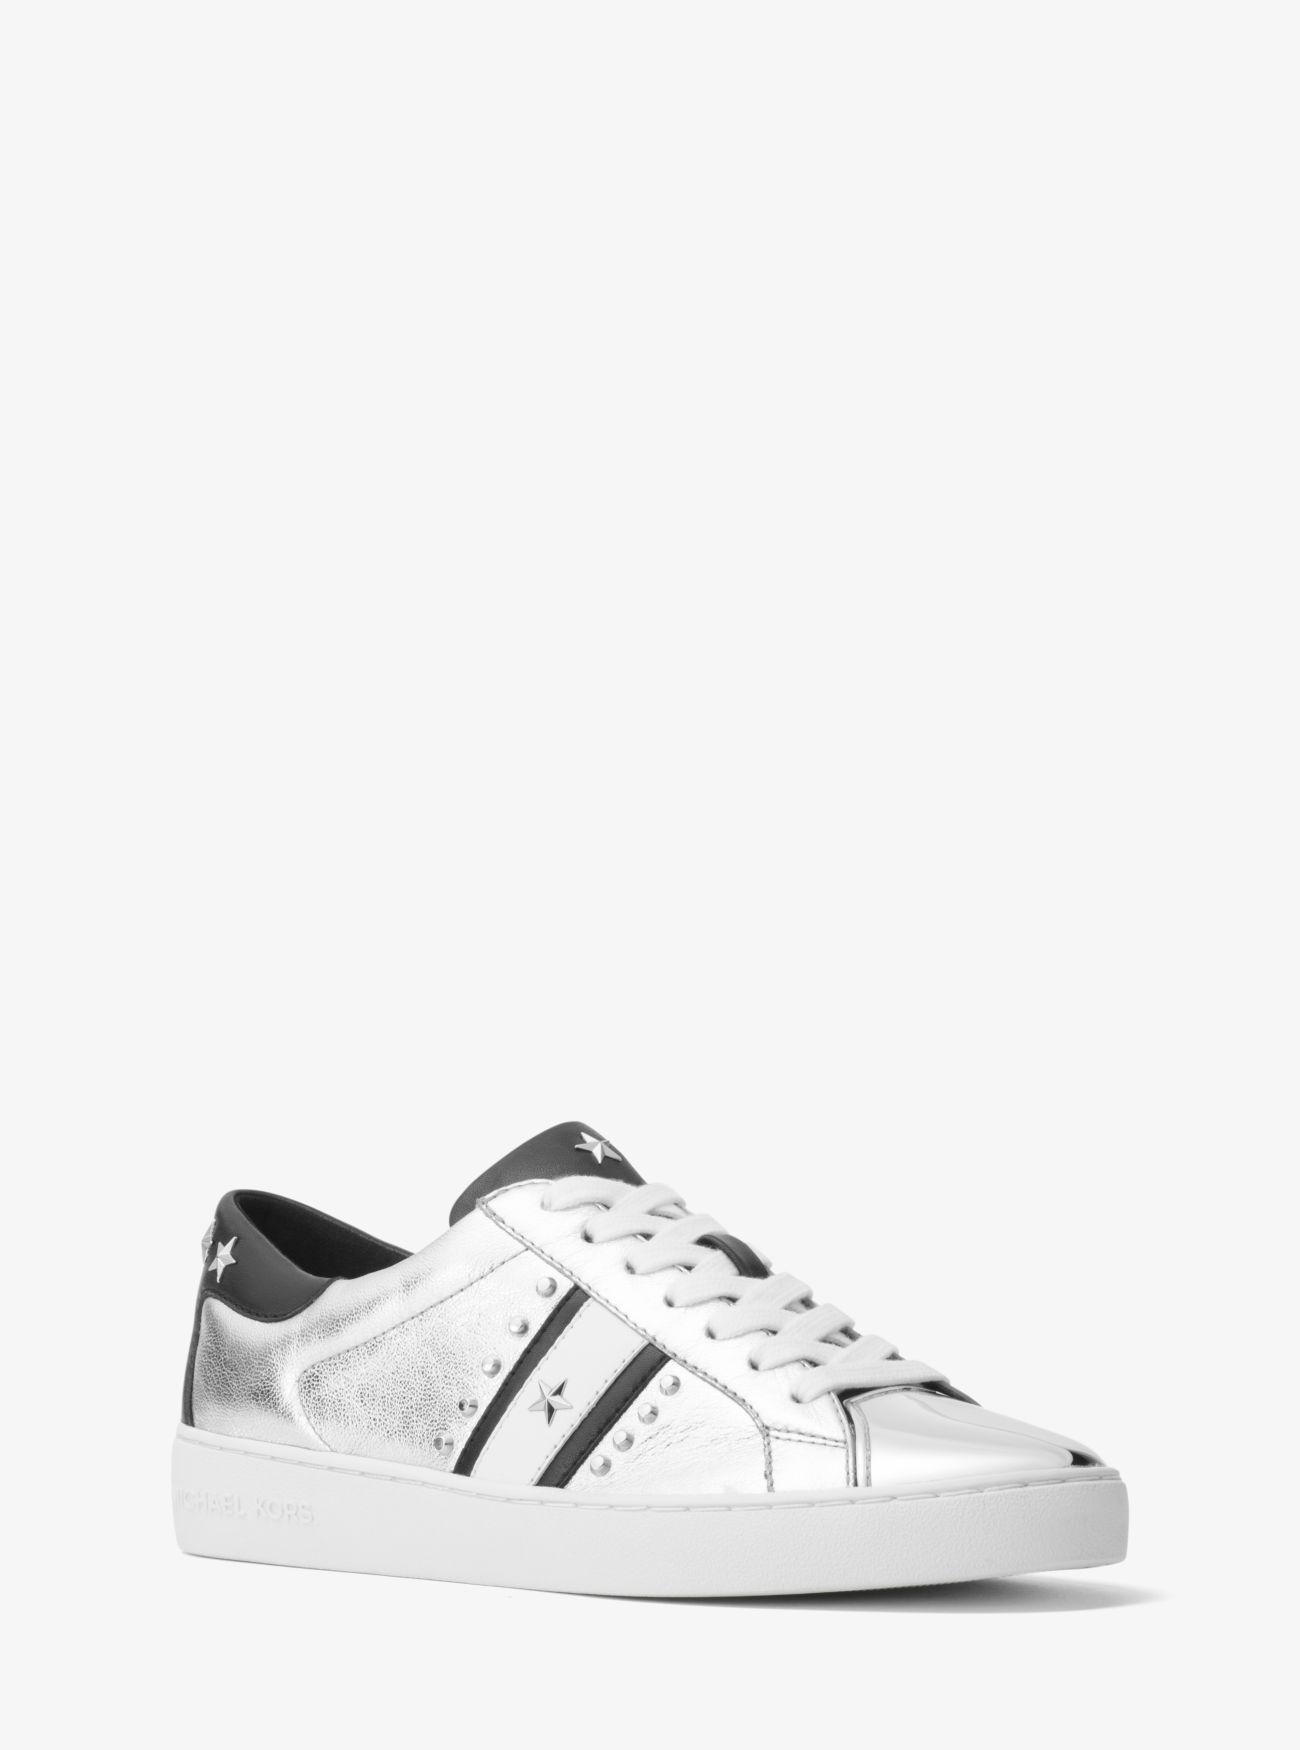 2a6683cf533b MICHAEL KORS Frankie Studded Metallic Leather Sneaker.  michaelkors  shoes